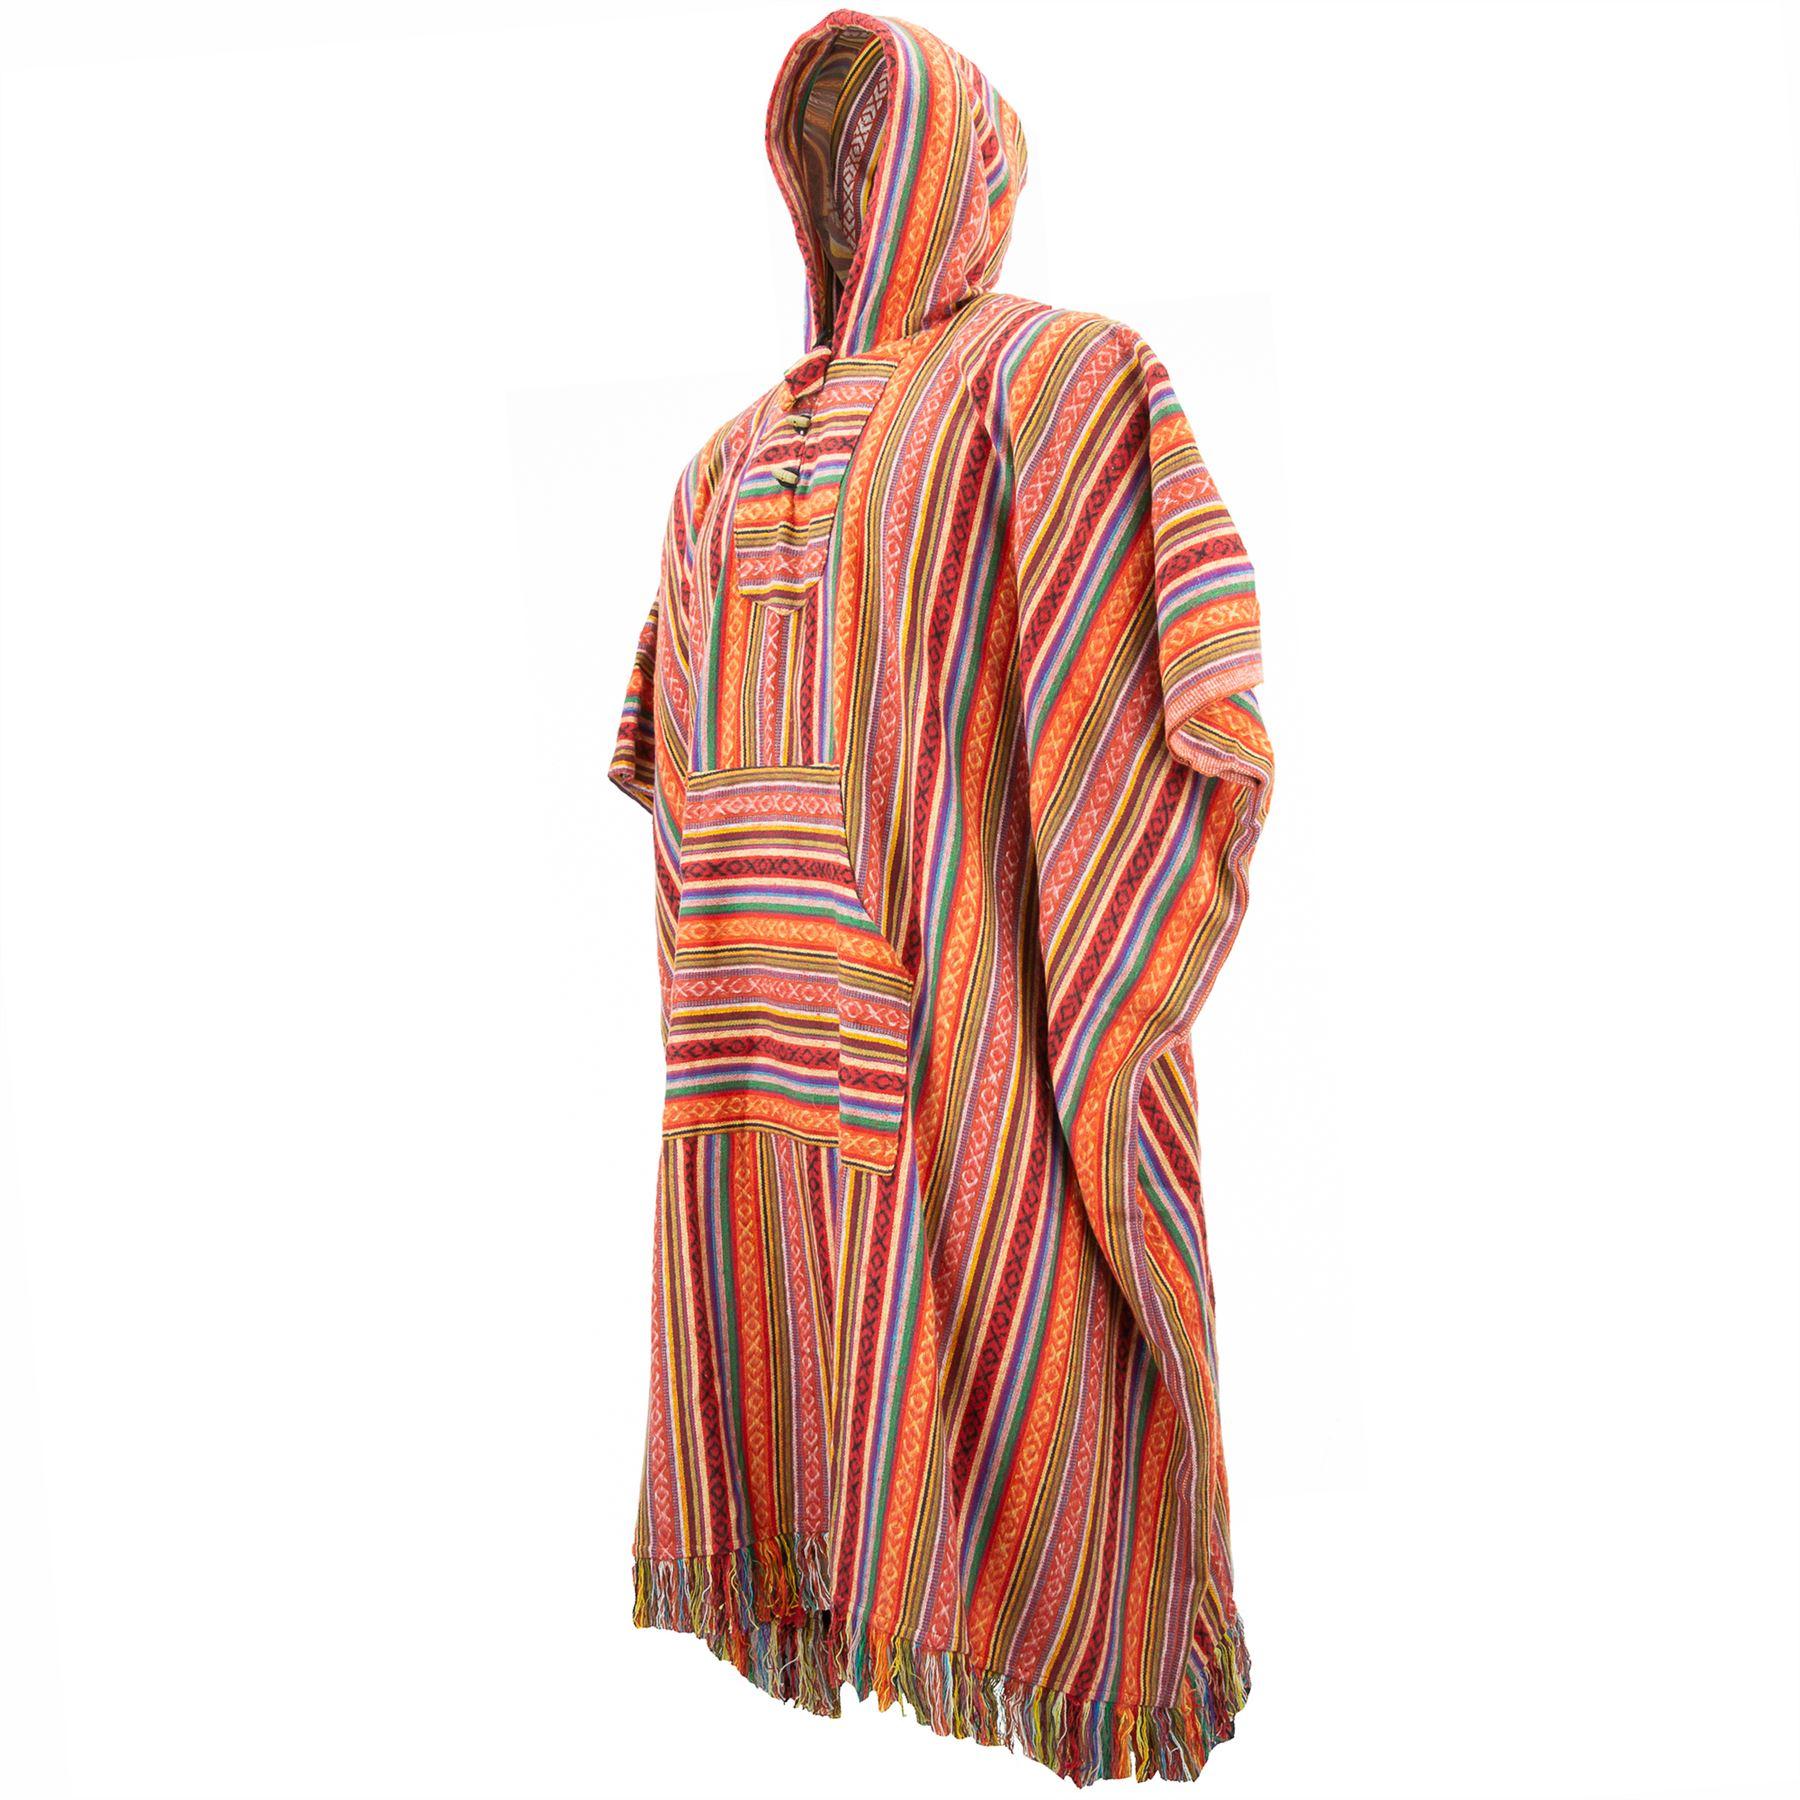 Poncho-Hooded-Cape-Cotton-Warm-Festival-Long-Woven-Rainbow-Men-Women thumbnail 4